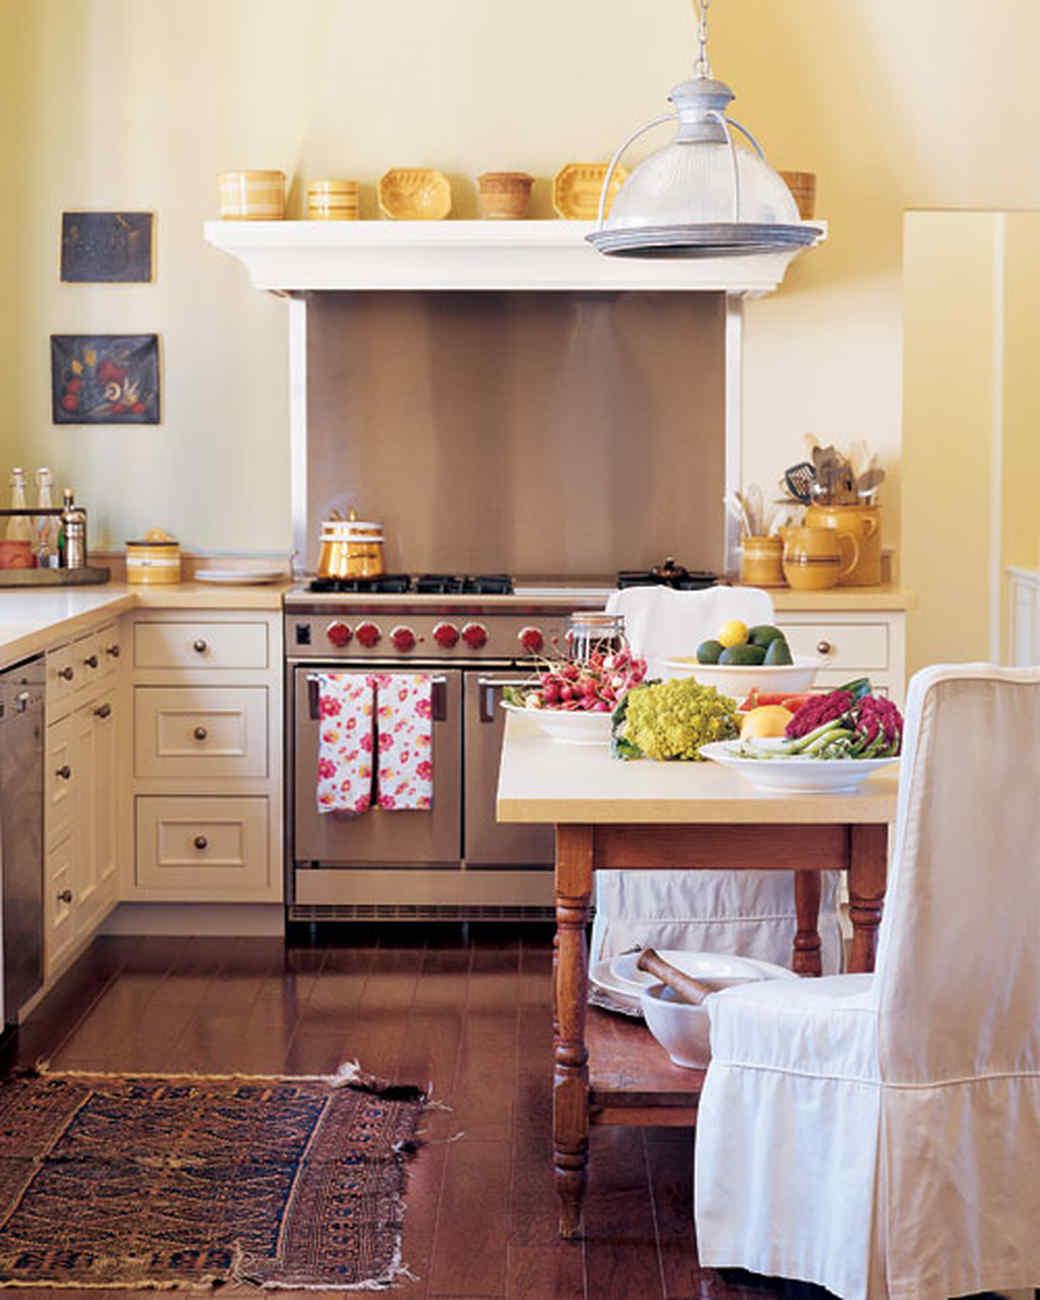 beach house kitchen backsplash ideas faucet handle 华丽厨房之旅玛莎 斯图尔特 澳门金沙 一张很棒的桌子